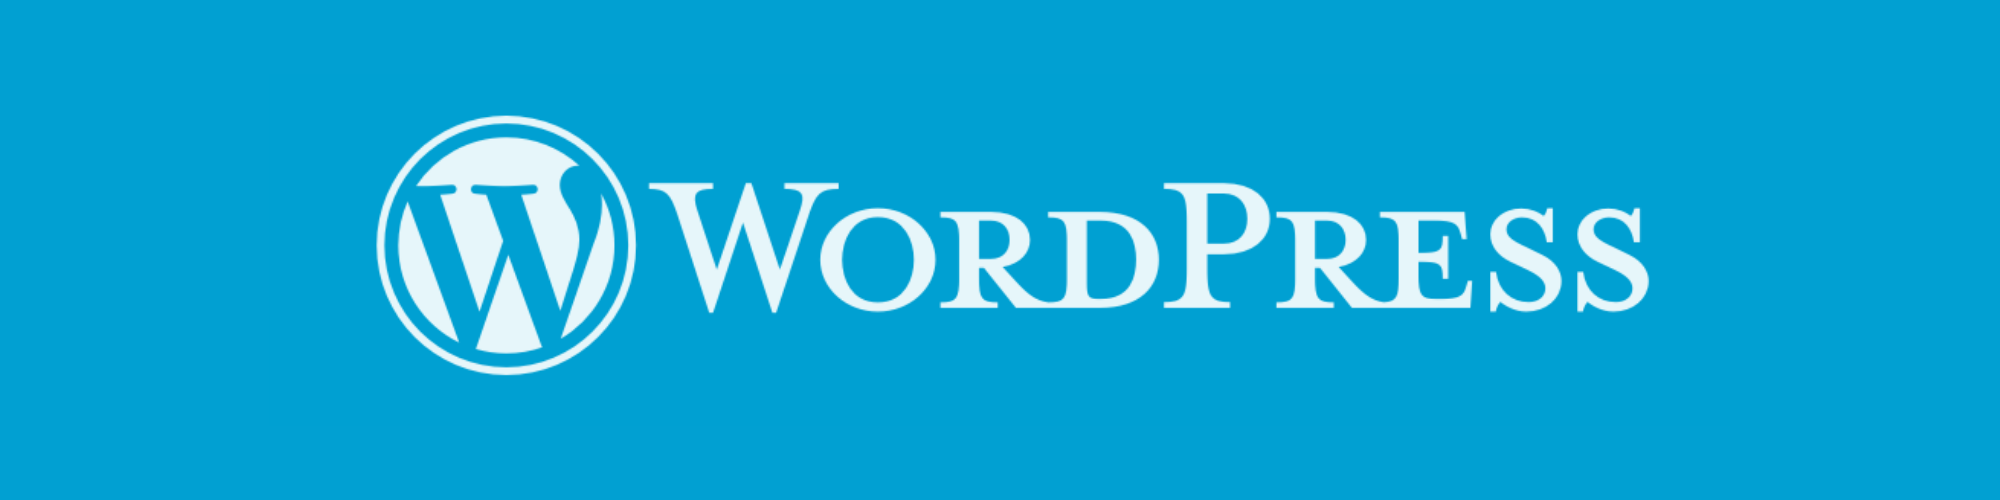 Banner WordPress